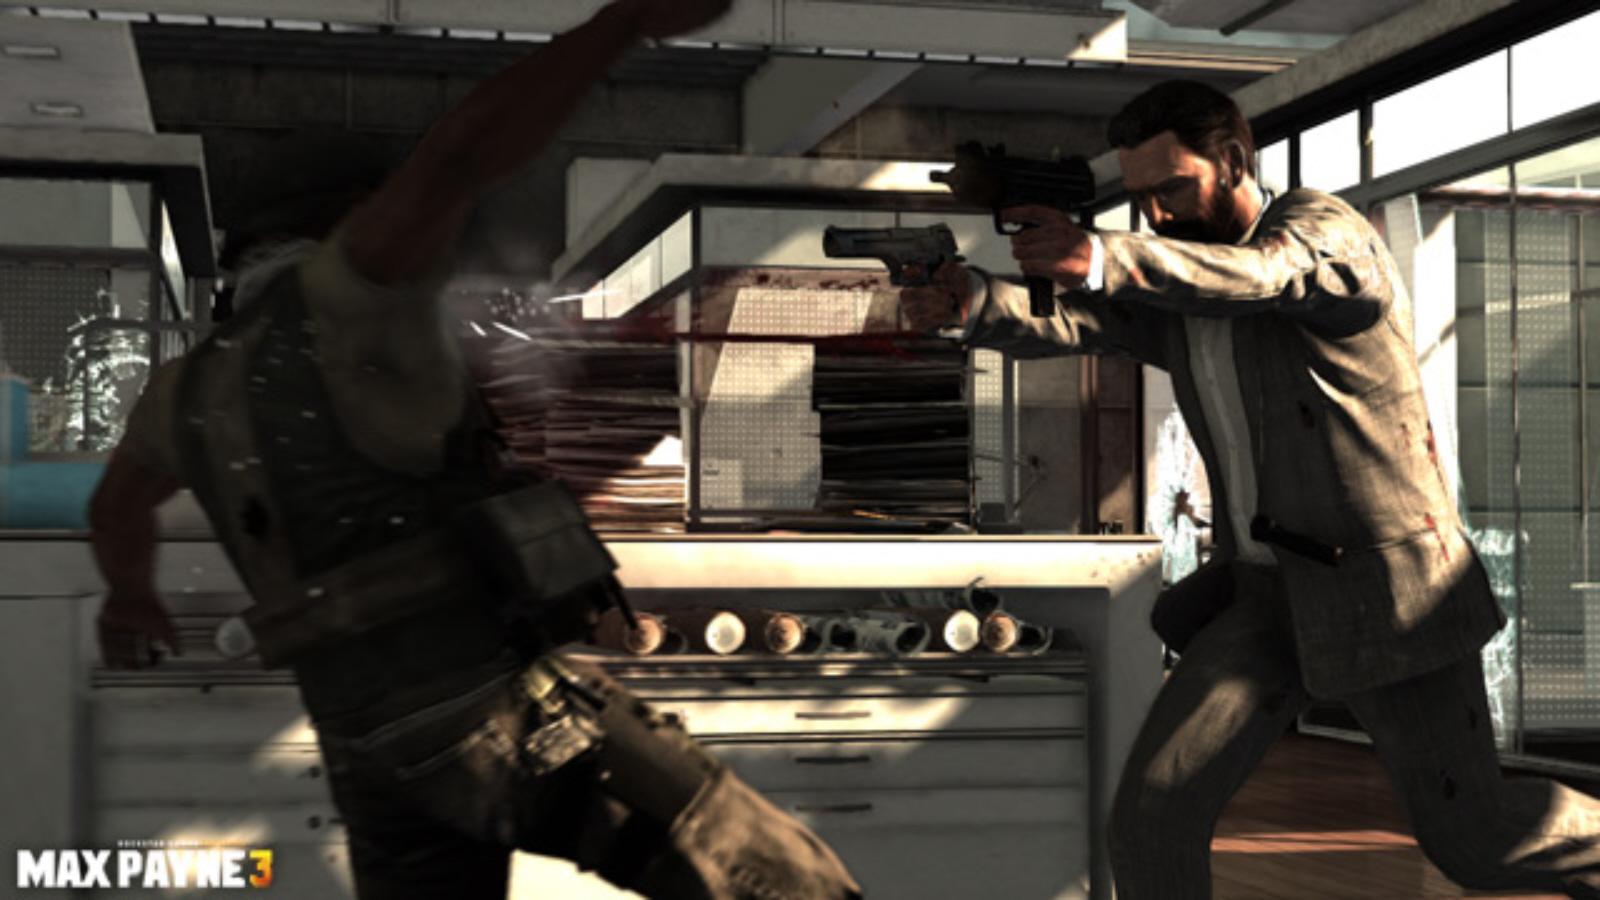 Max Payne 3 Gameplay Shootout Screenshot Xbox 360 Ps3 Pc